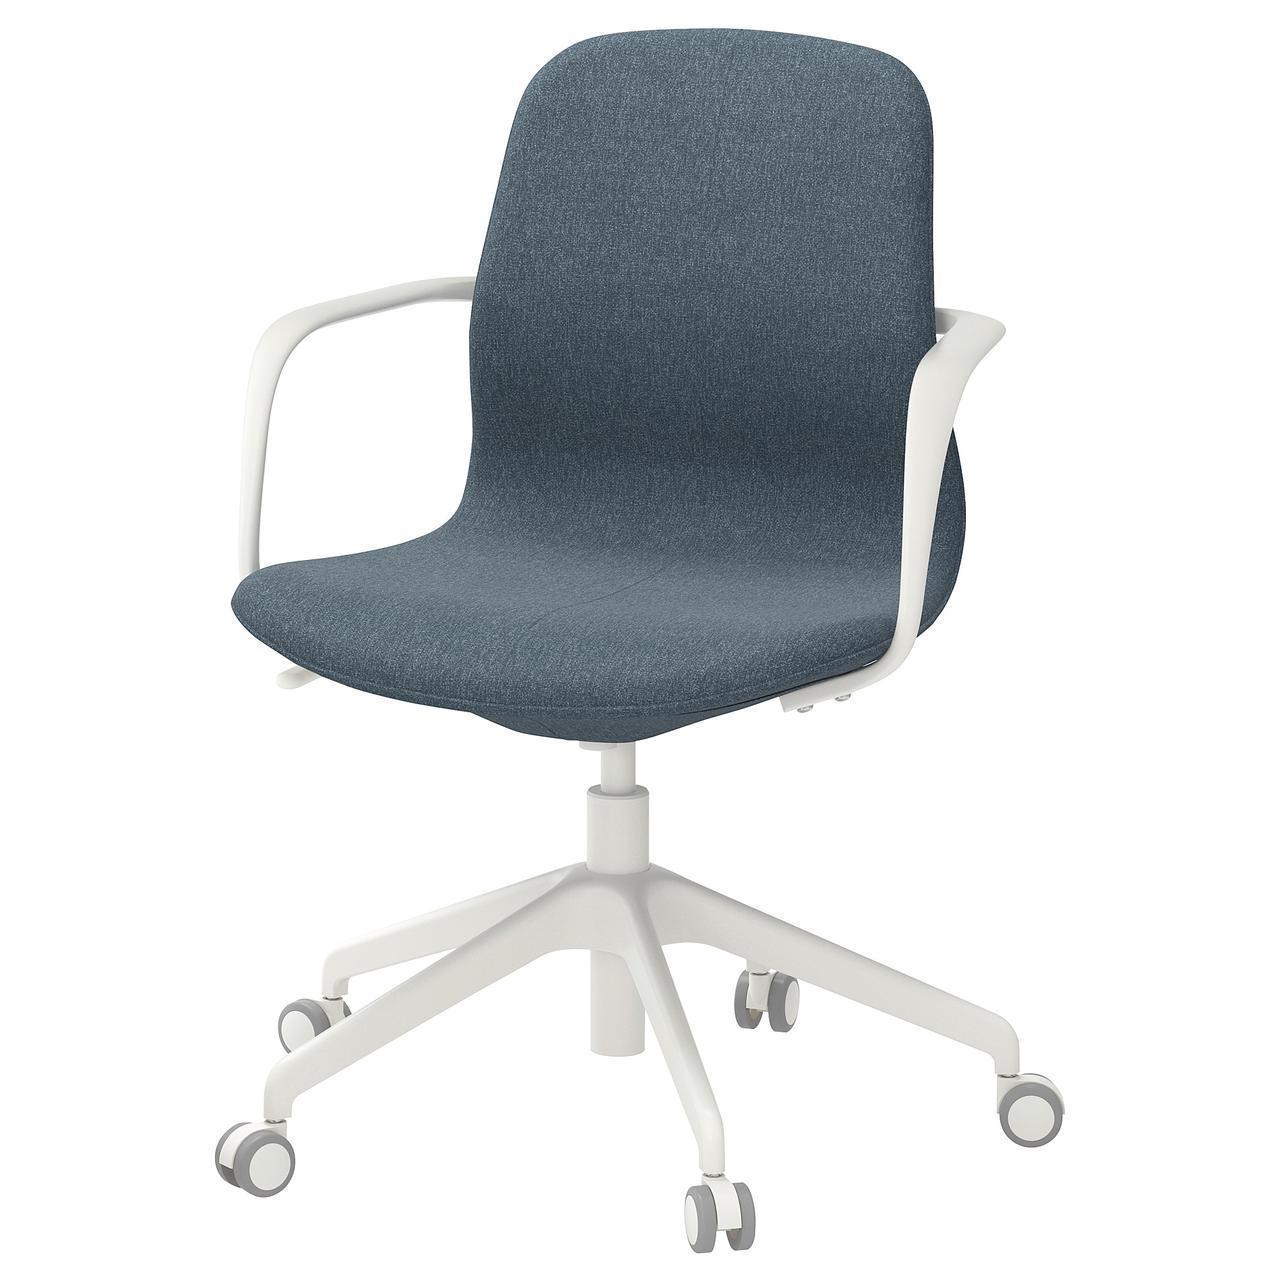 Компьютерное кресло IKEA LÅNGFJÄLL Gunnared голубое белое 692.527.69